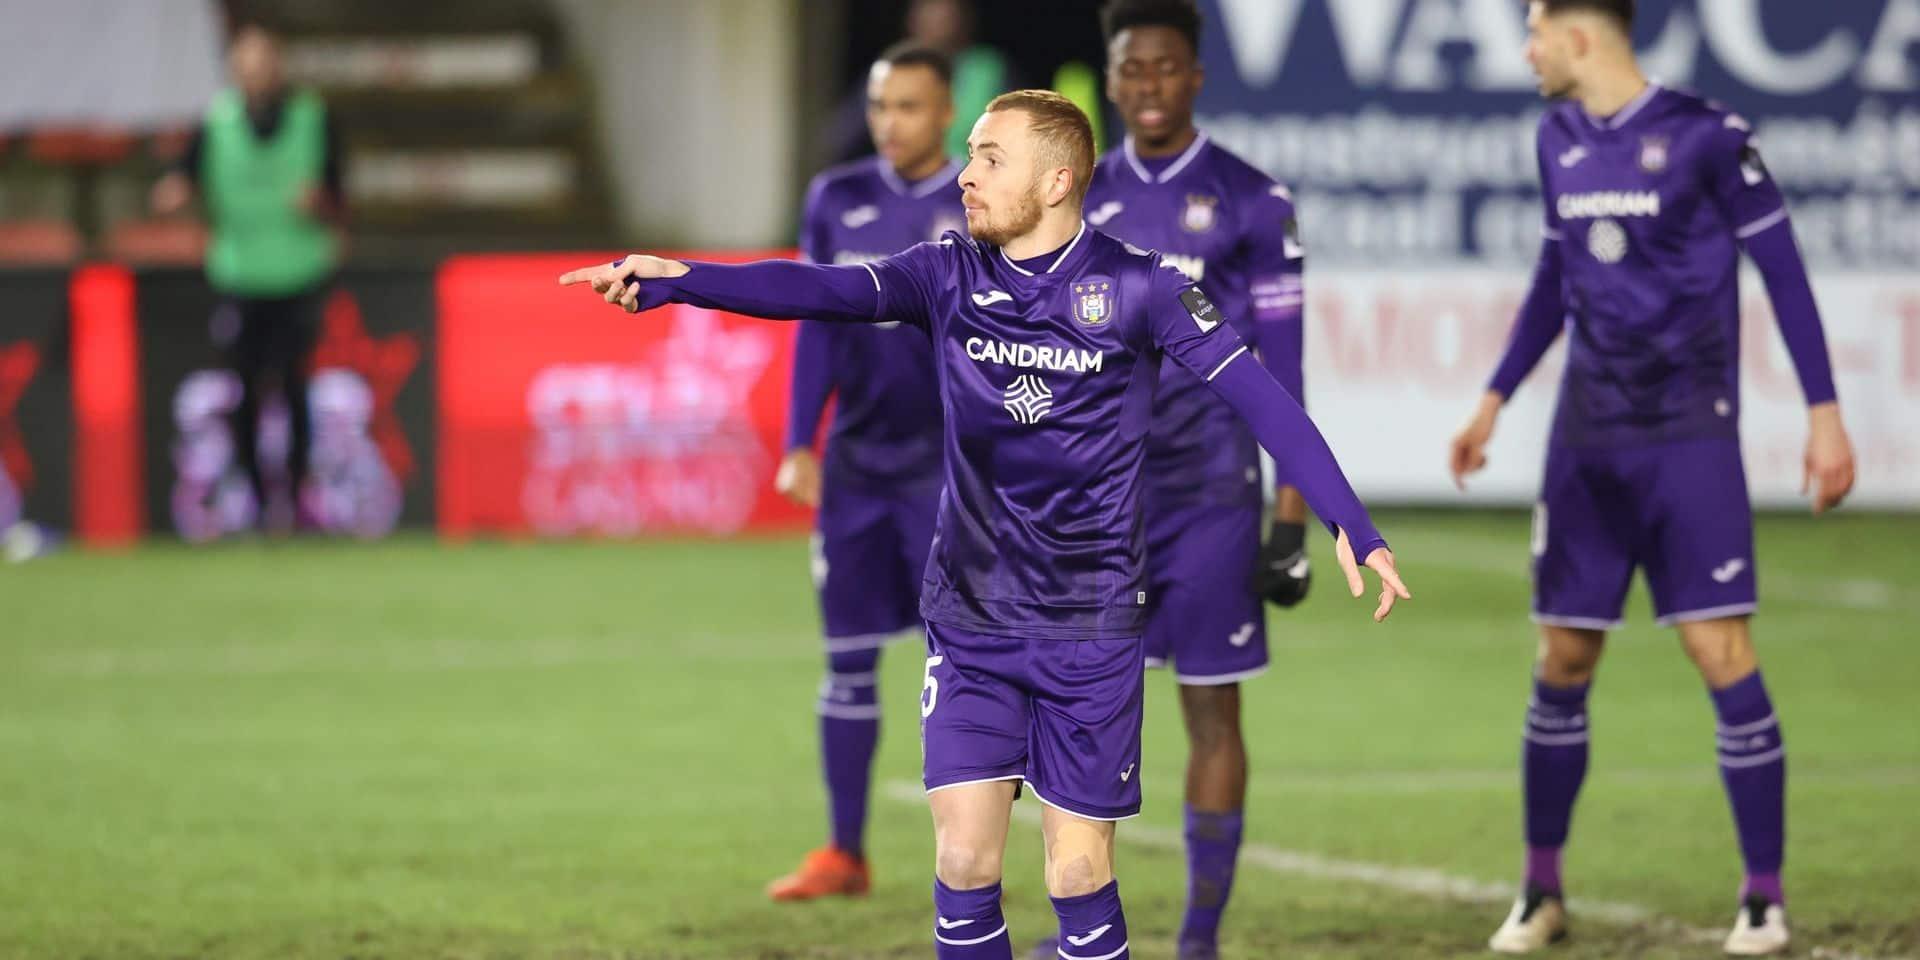 Anderlecht se rassure et renverse Zulte Waregem au bout d'un match abouti (4-1)